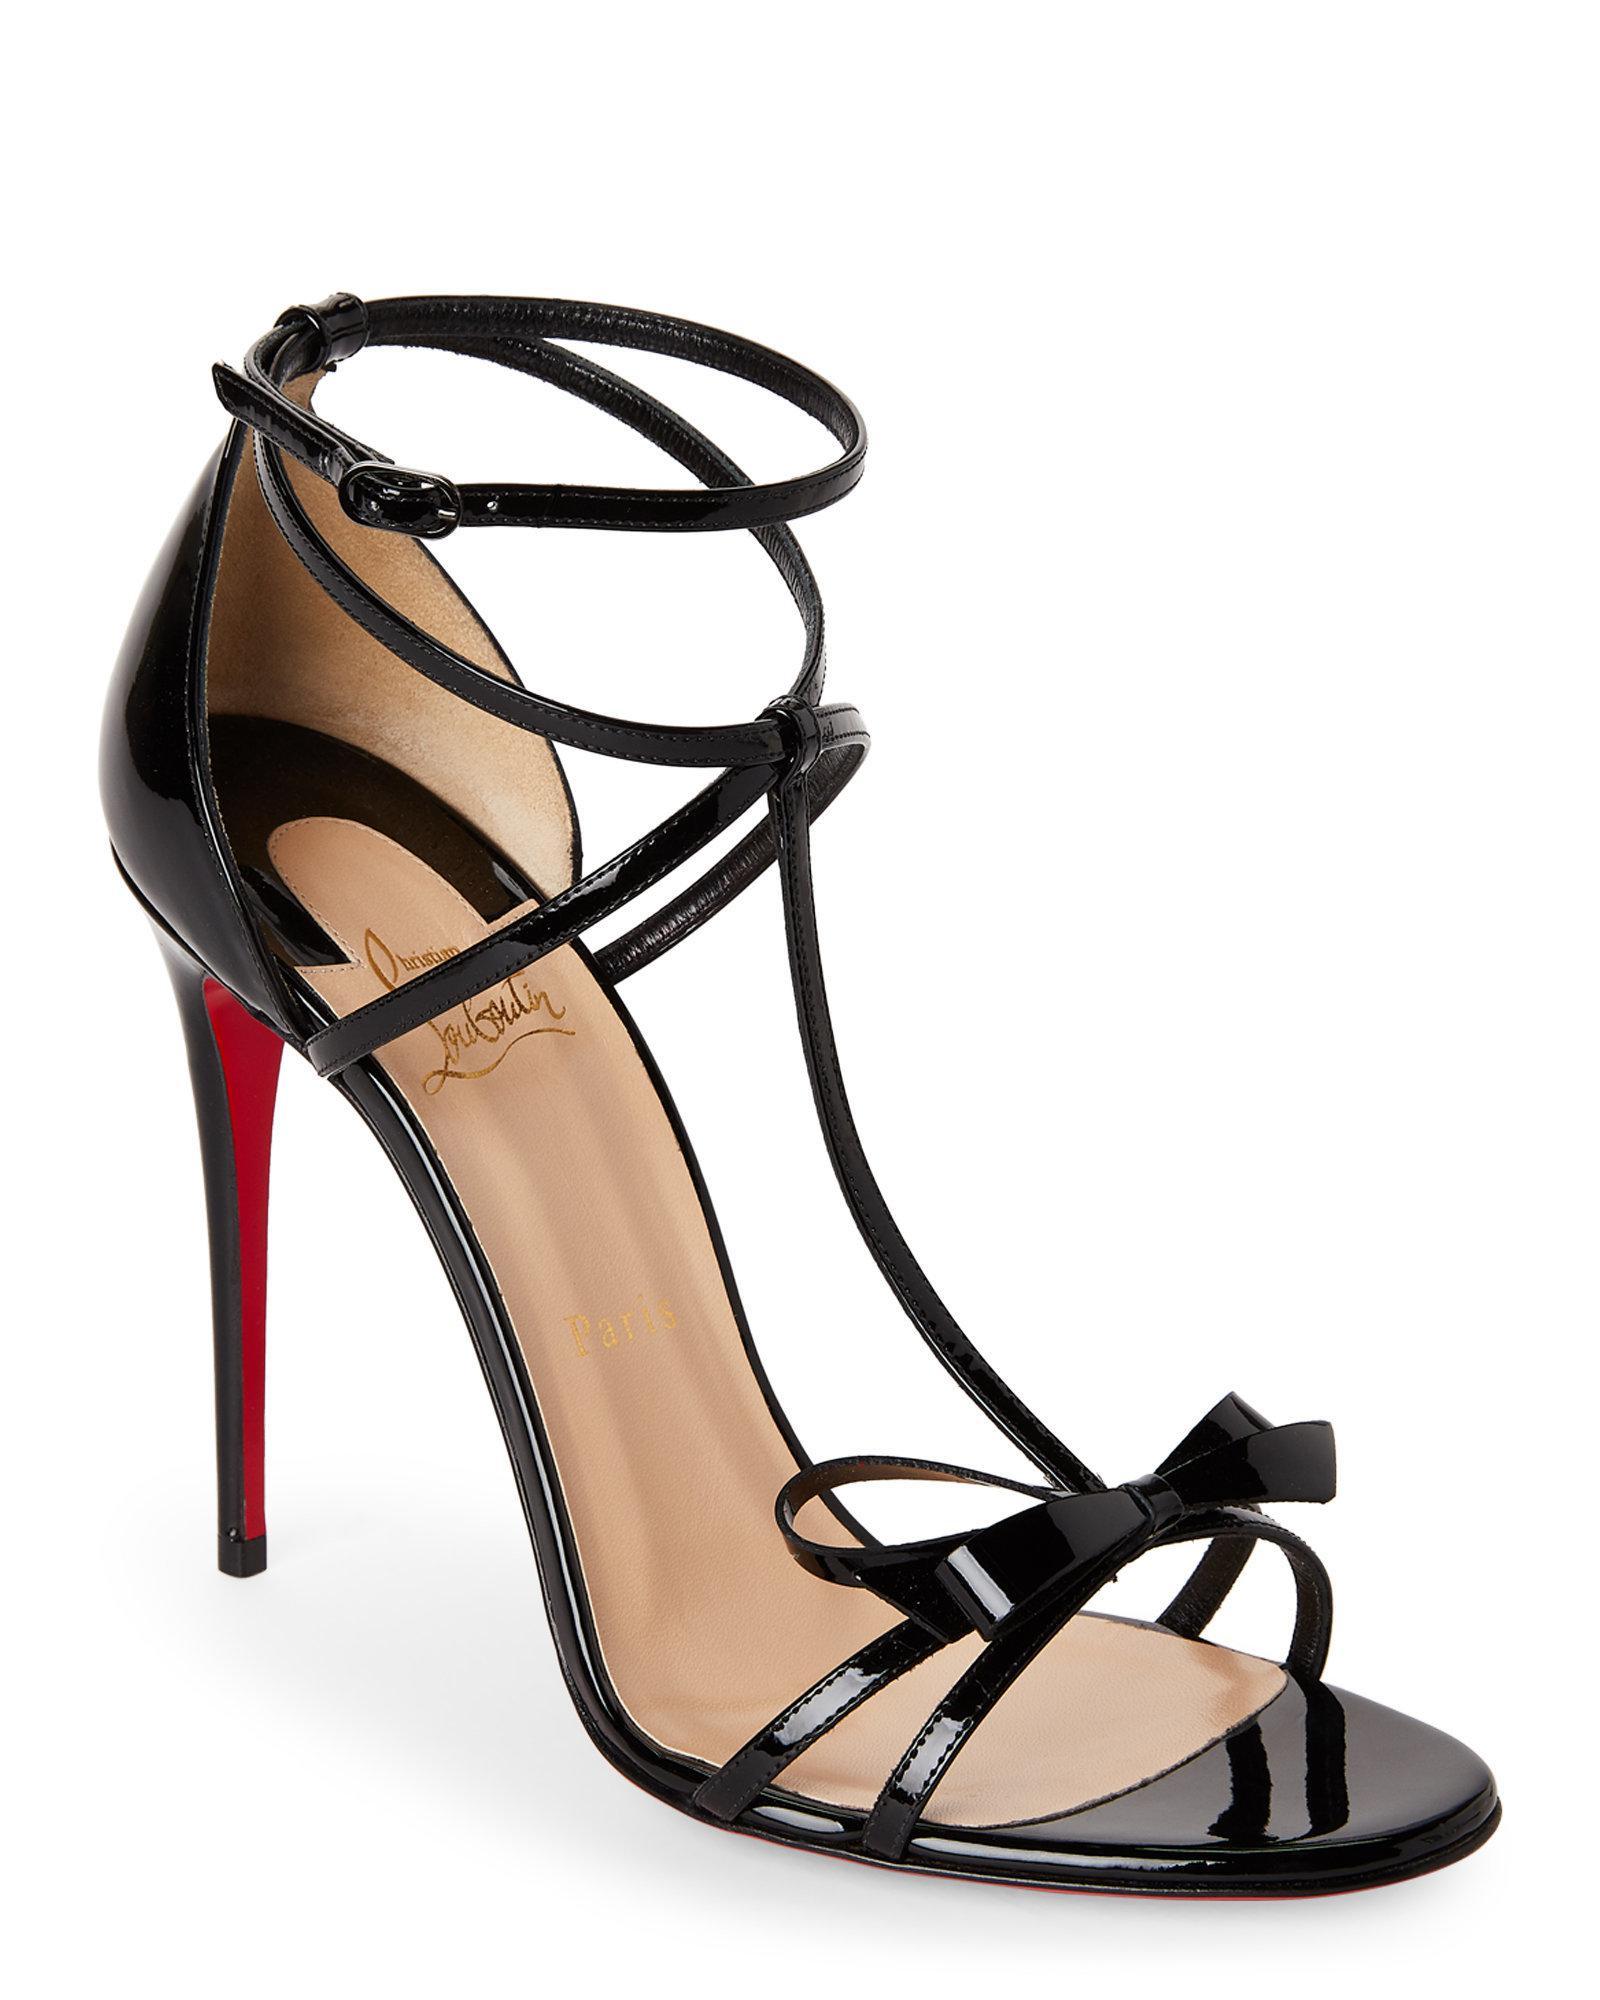 huge discount 58105 e403e Christian Louboutin Black Blakissima Strappy Bow Sandals